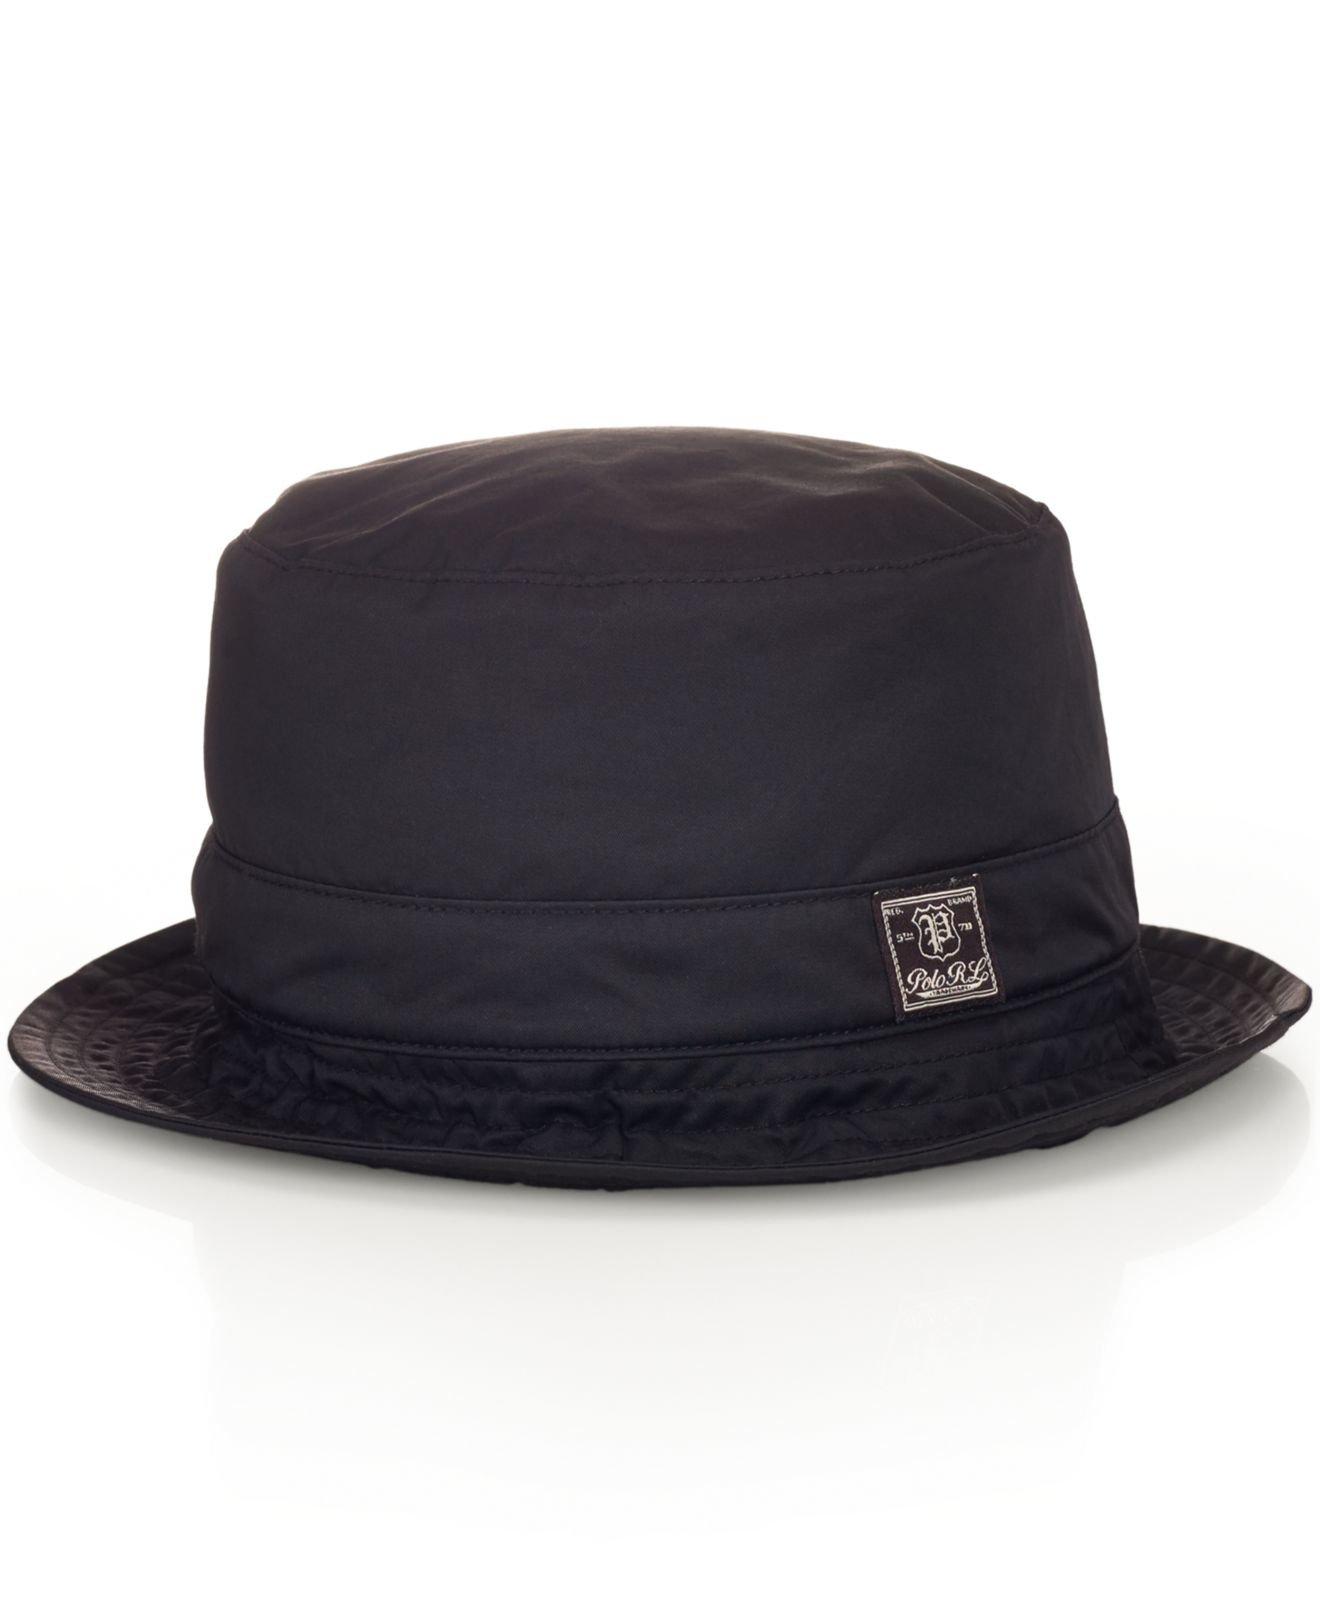 04eb426b9bf7b Polo Ralph Lauren Twill Bucket Hat in Black for Men - Lyst